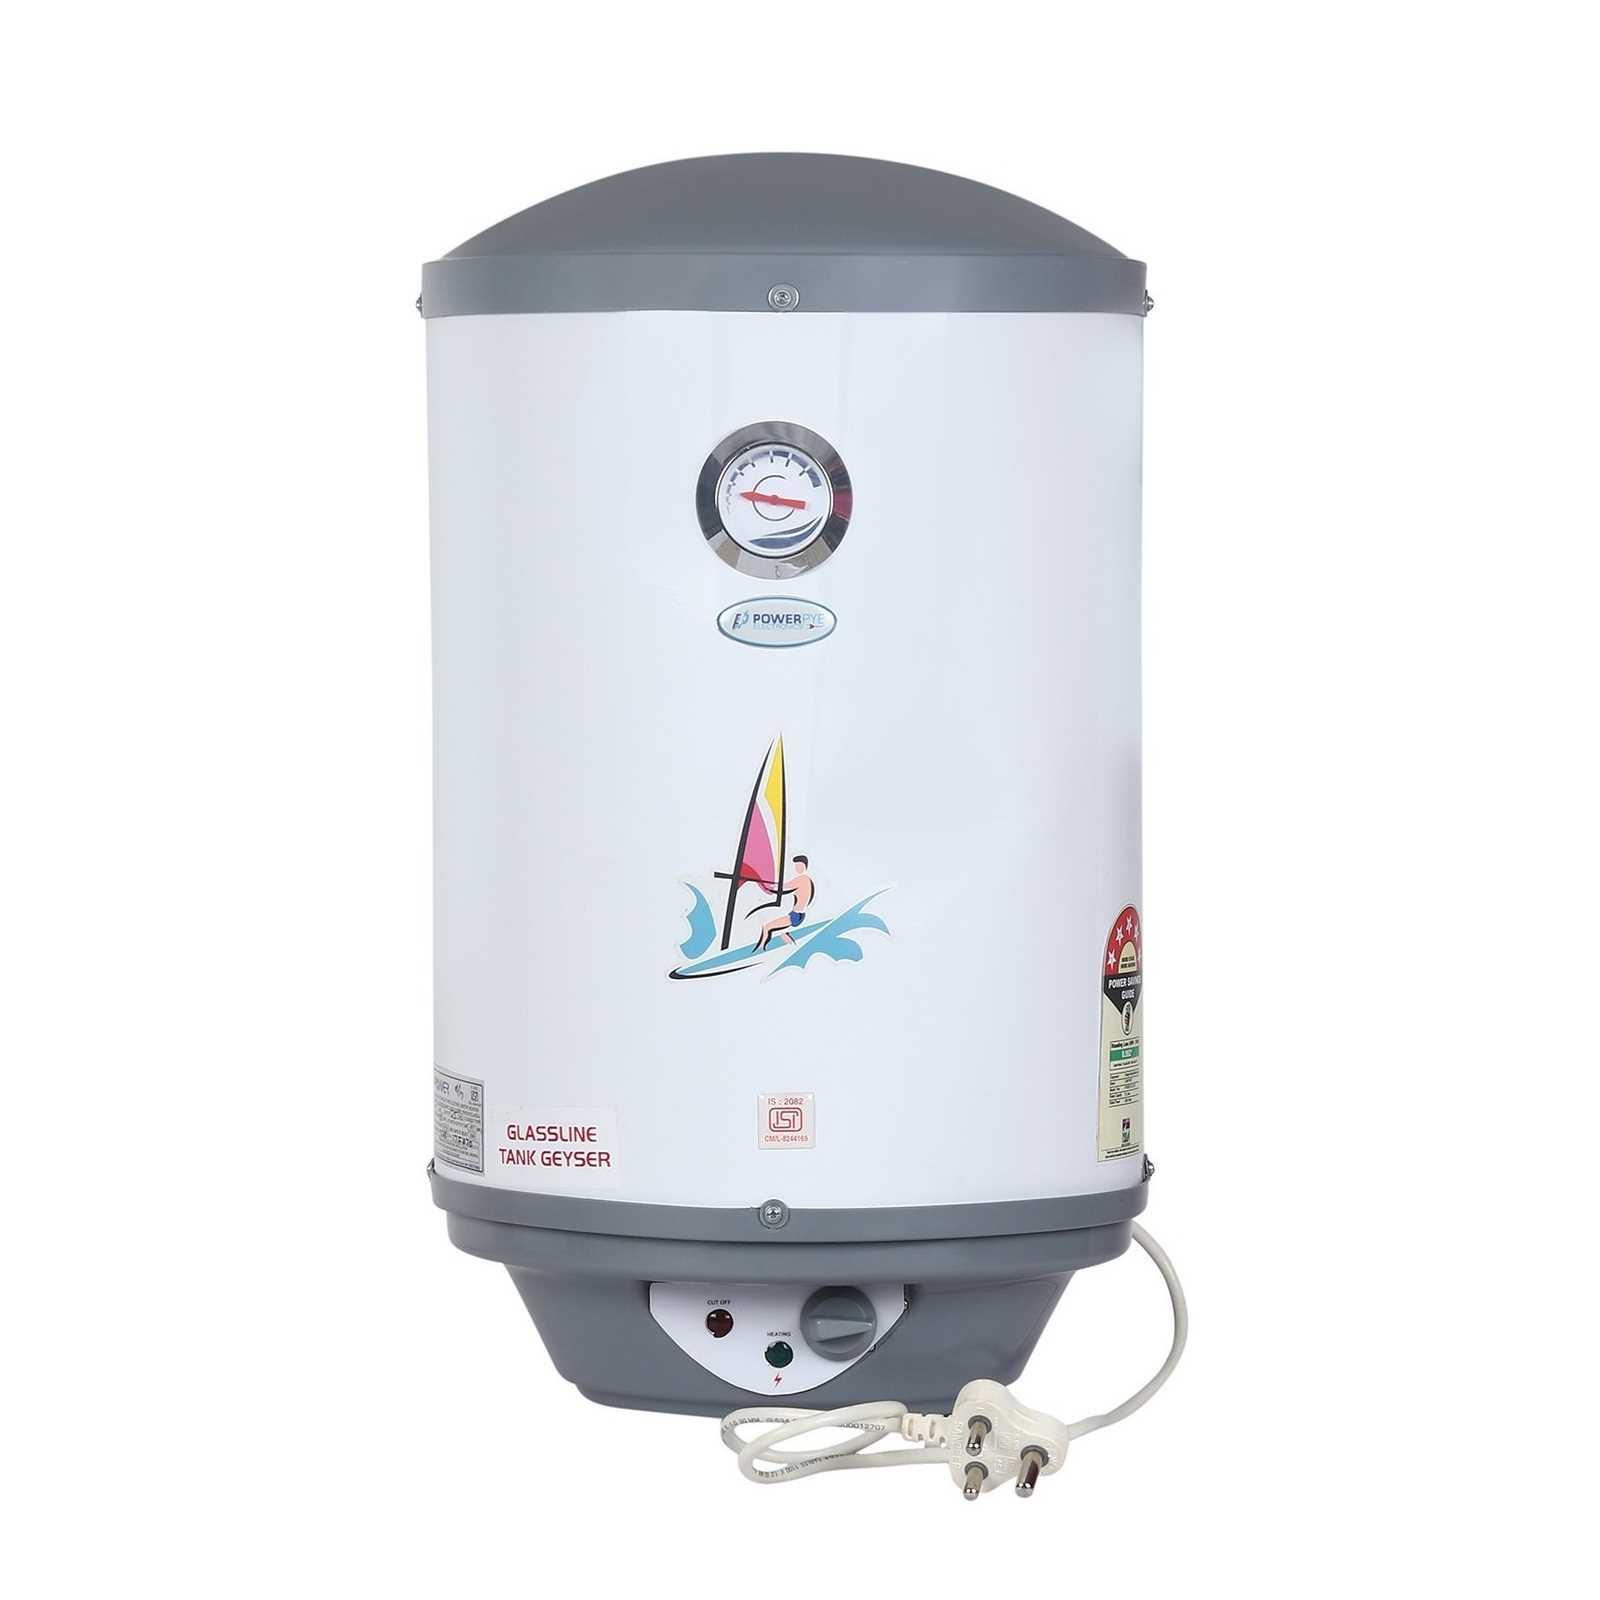 Powerpye Glassline 25 litre Storage Water Heater